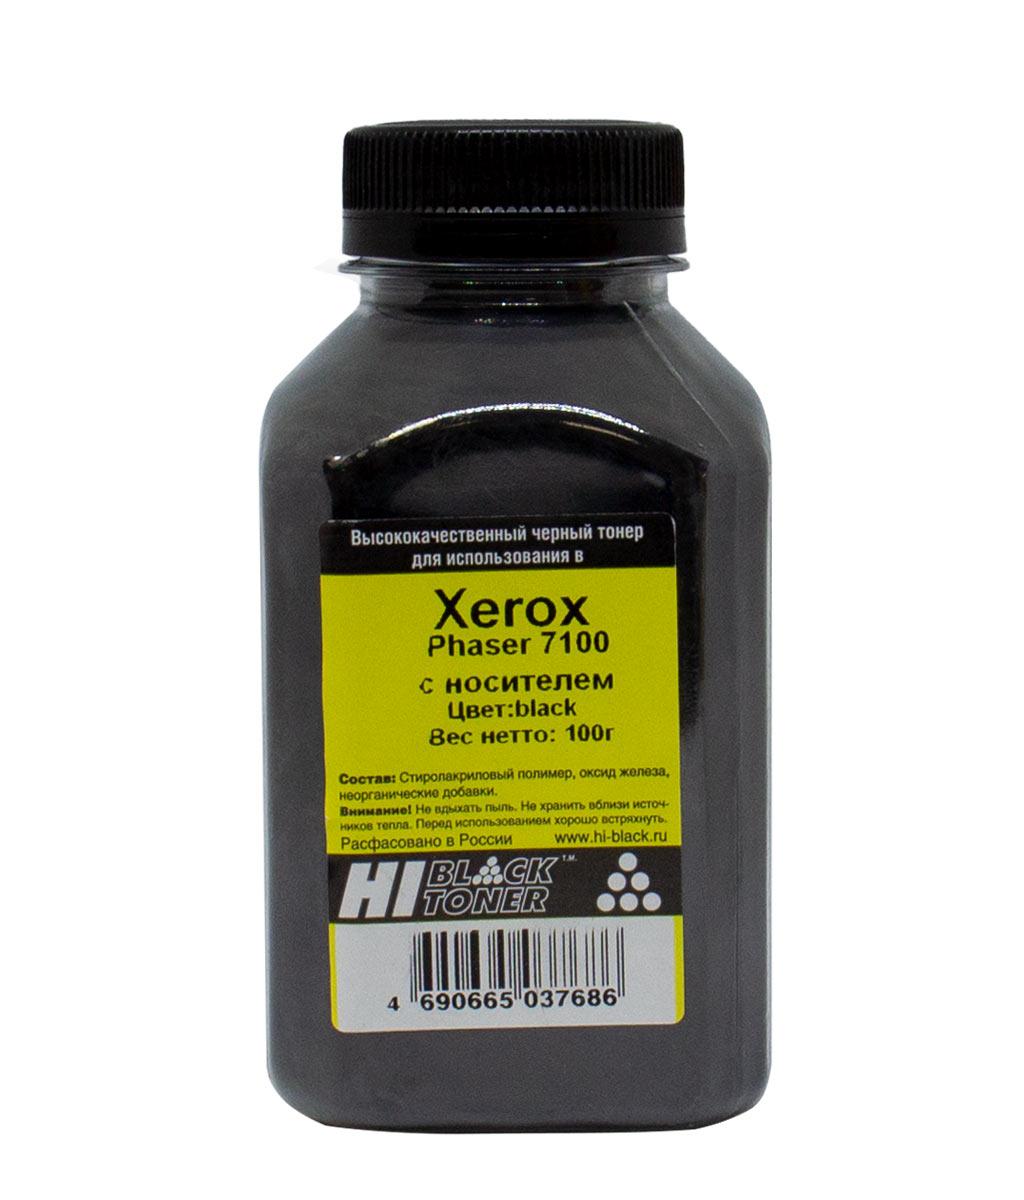 Тонер Hi-Black с носителем для Xerox Phaser 7100, Bk, 100 г, банка